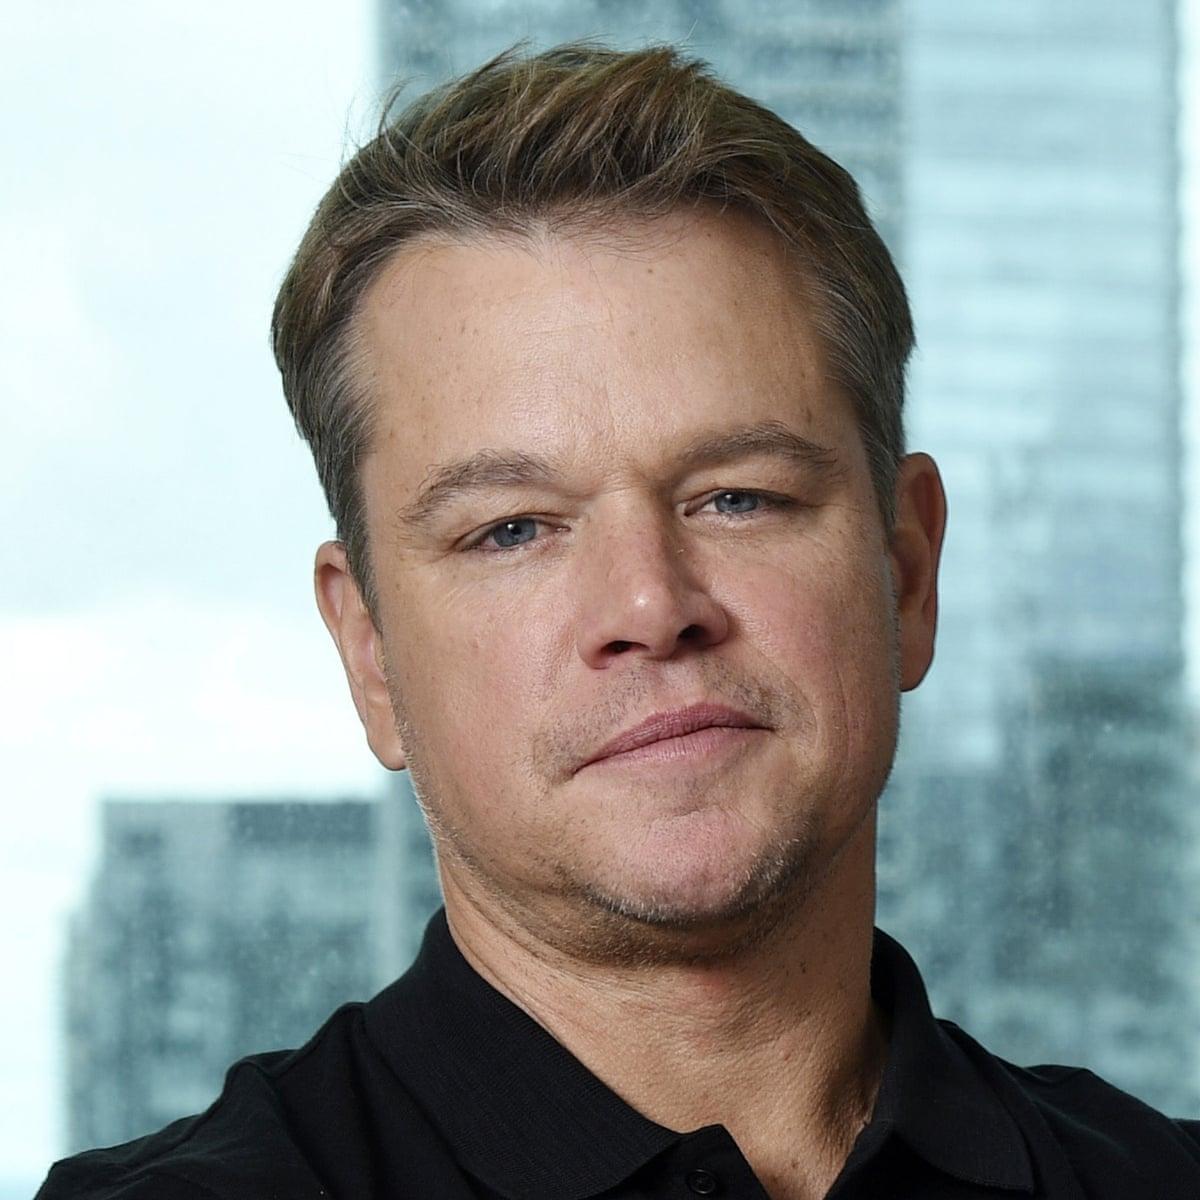 Matt Damon says his Ireland lockdown feels like 'a fairytale' | Matt Damon  | The Guardian